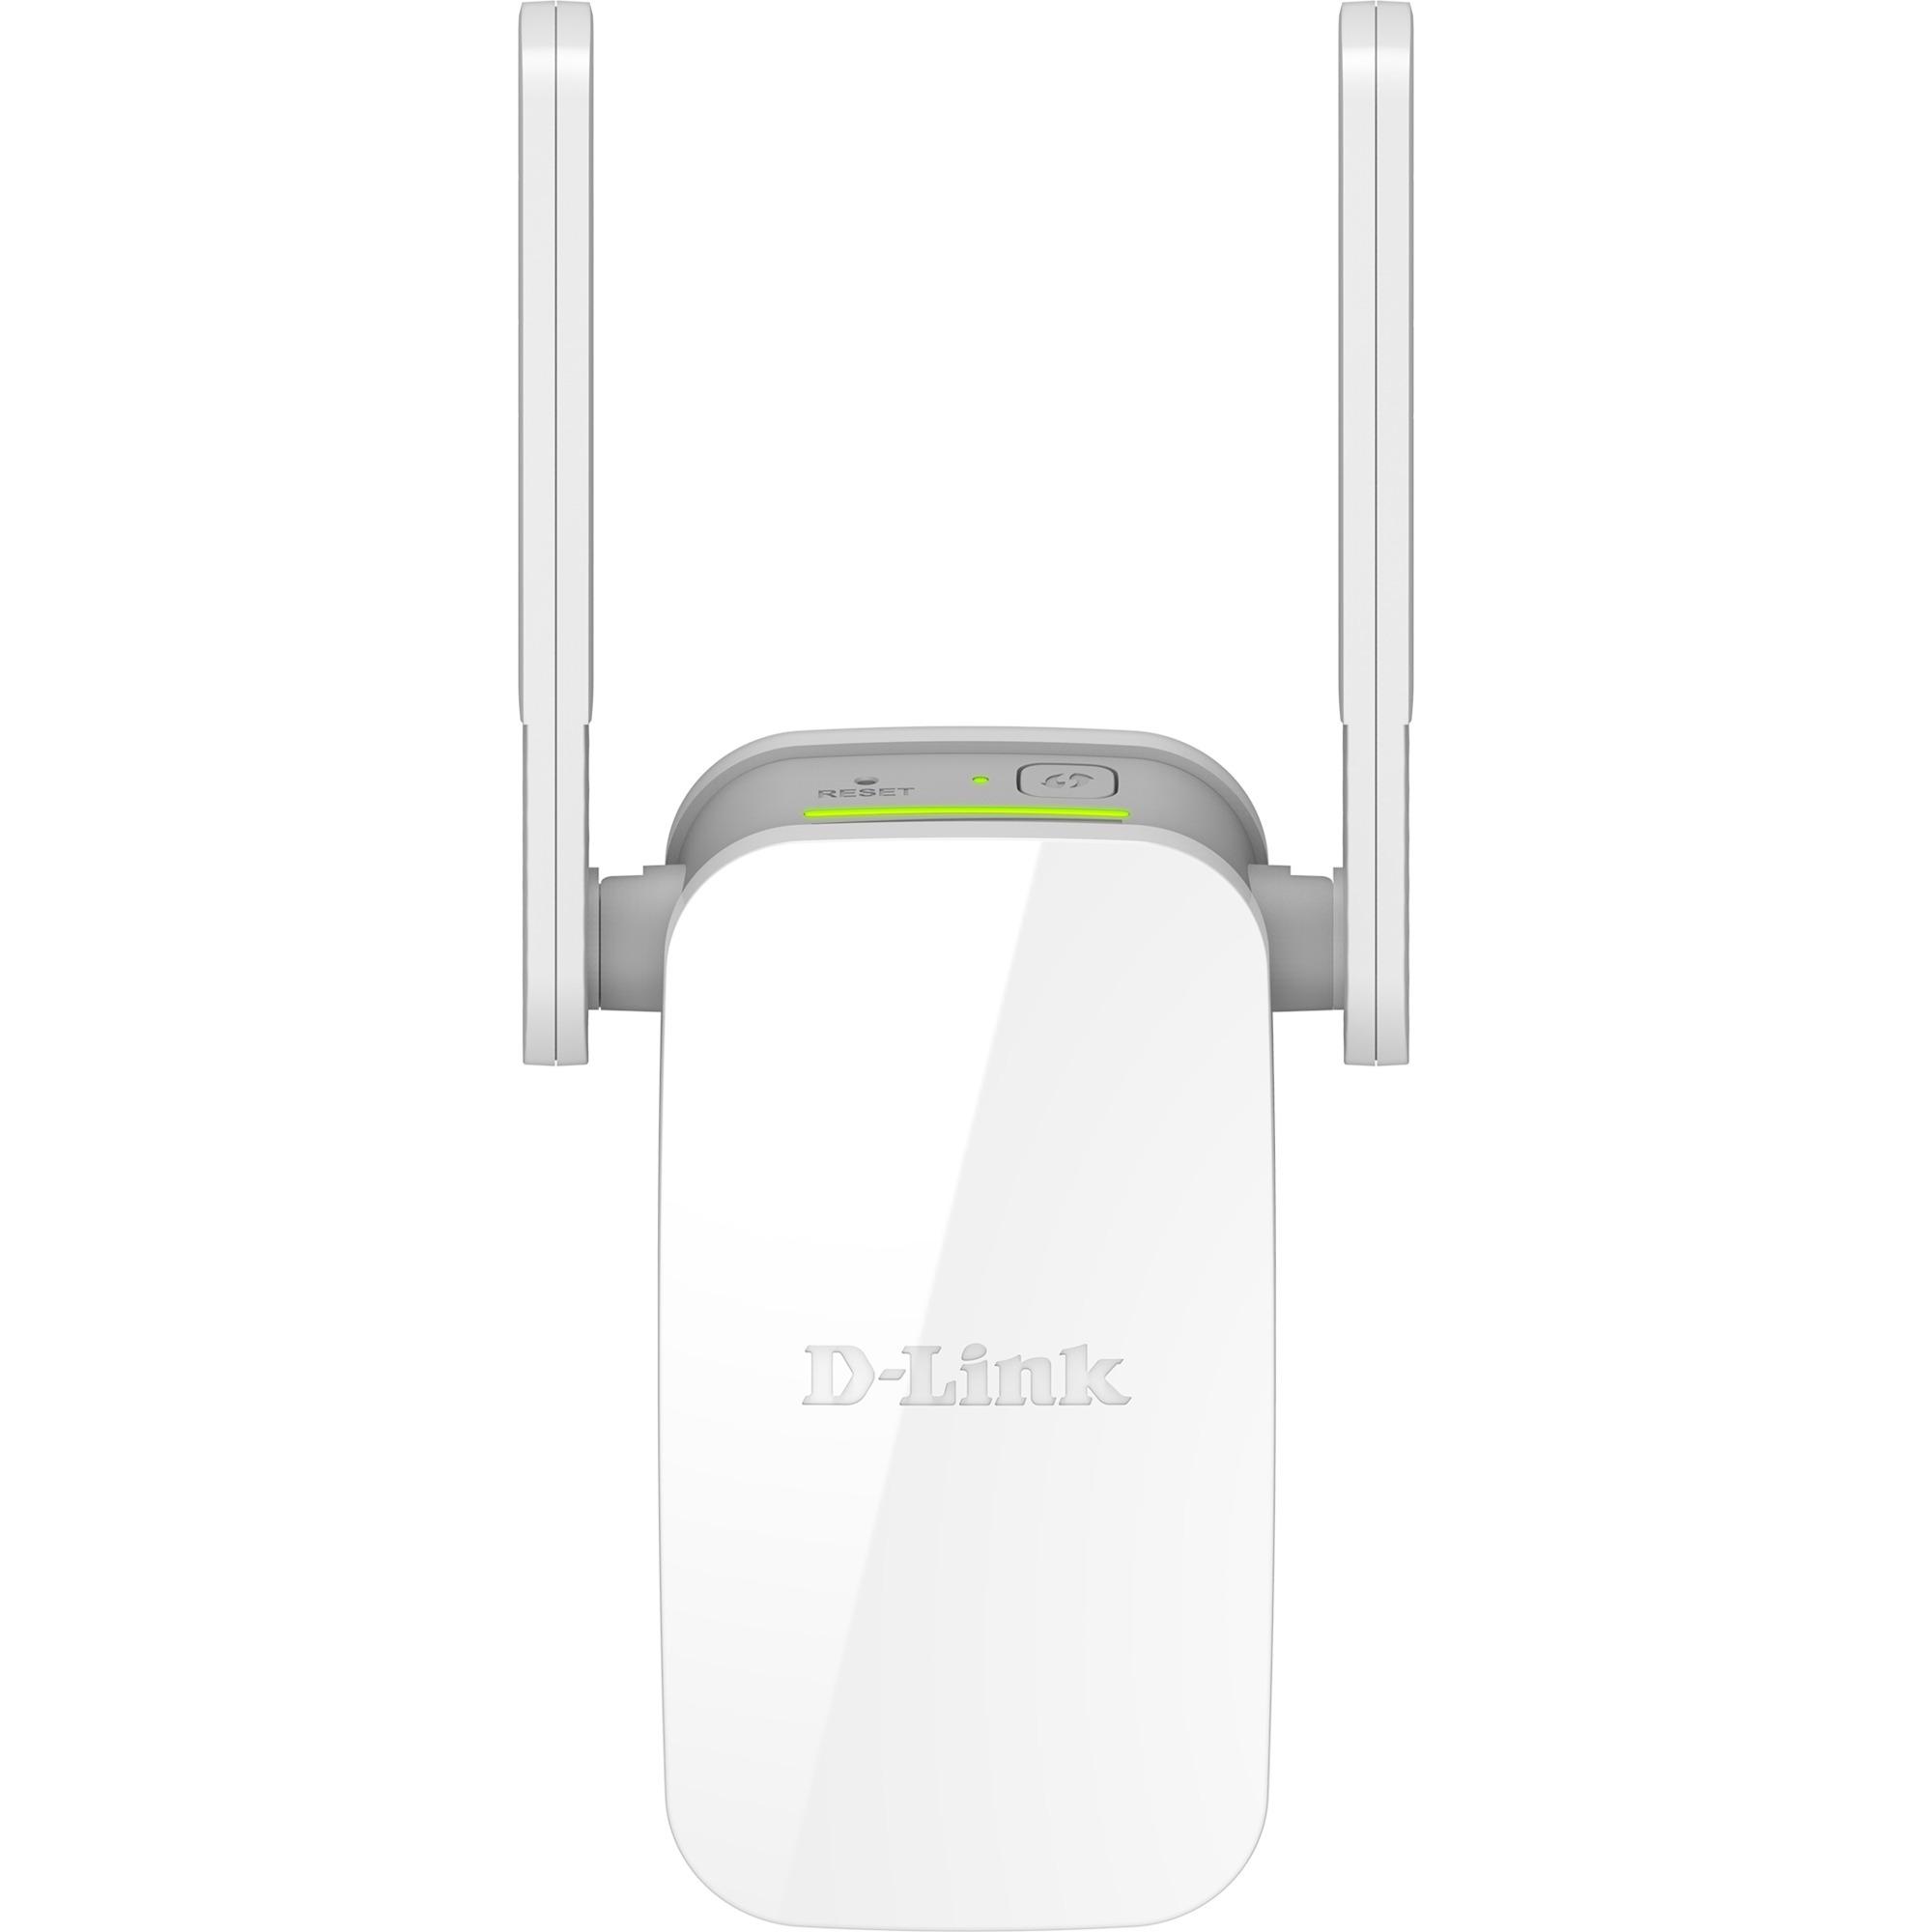 DAP-1610 Network transmitter & receiver Blanco 10, 100Mbit/s, Repetidor